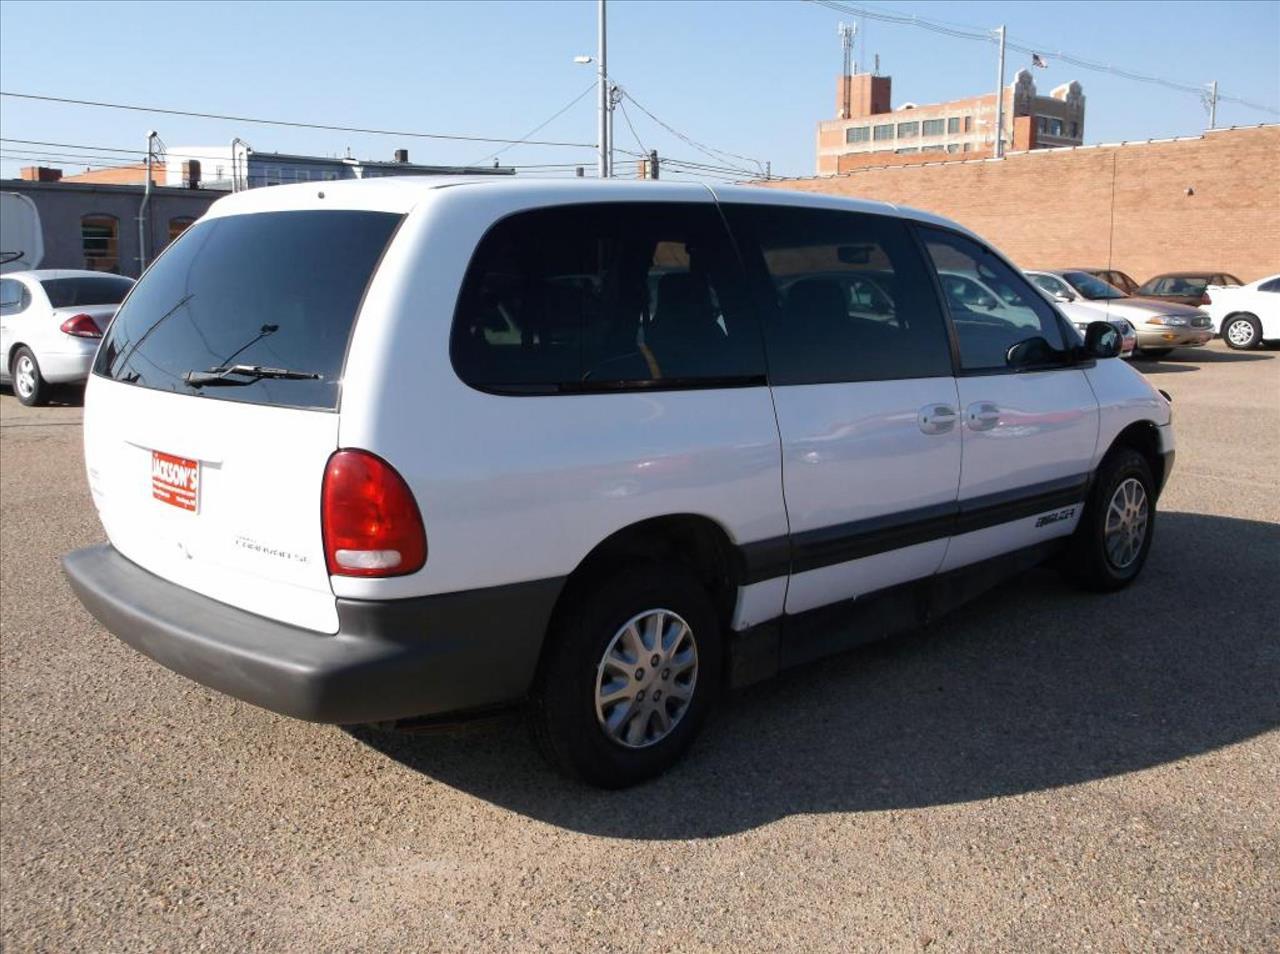 Dodge dodge 1999 caravan : 1999 Dodge Grand Caravan SE In Hastings NE - Jacksons Car Corner Inc